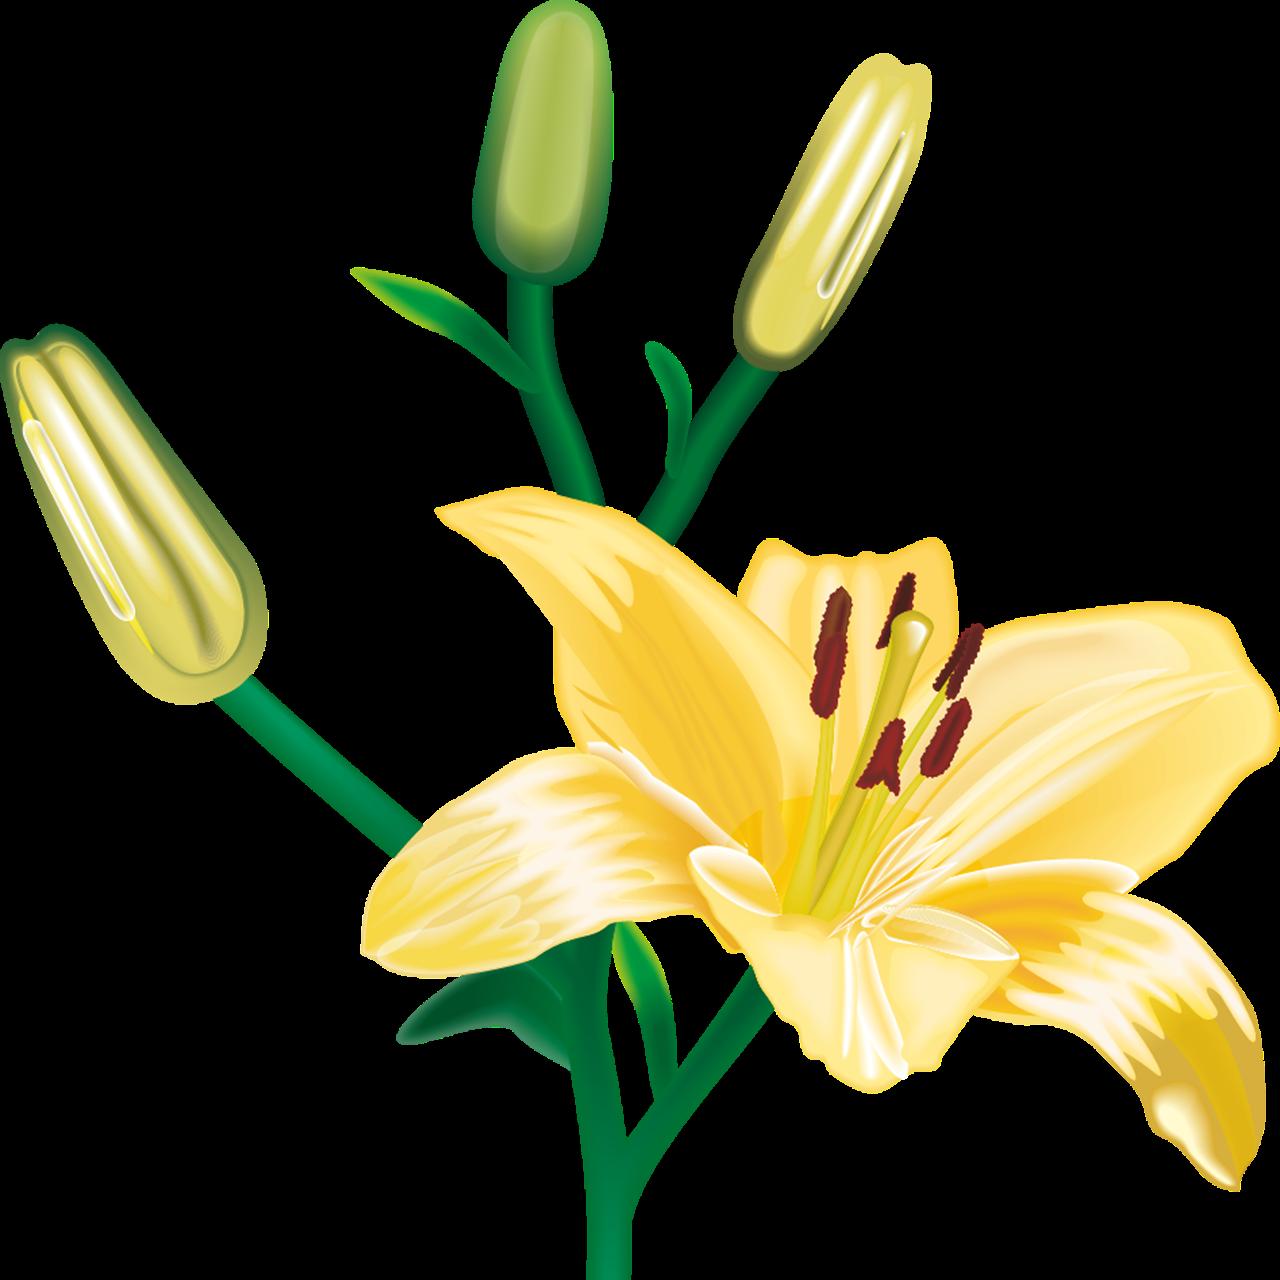 Imagenes De Flores Transparentes - imagenes hermosas que brillen Imagenes Chidas